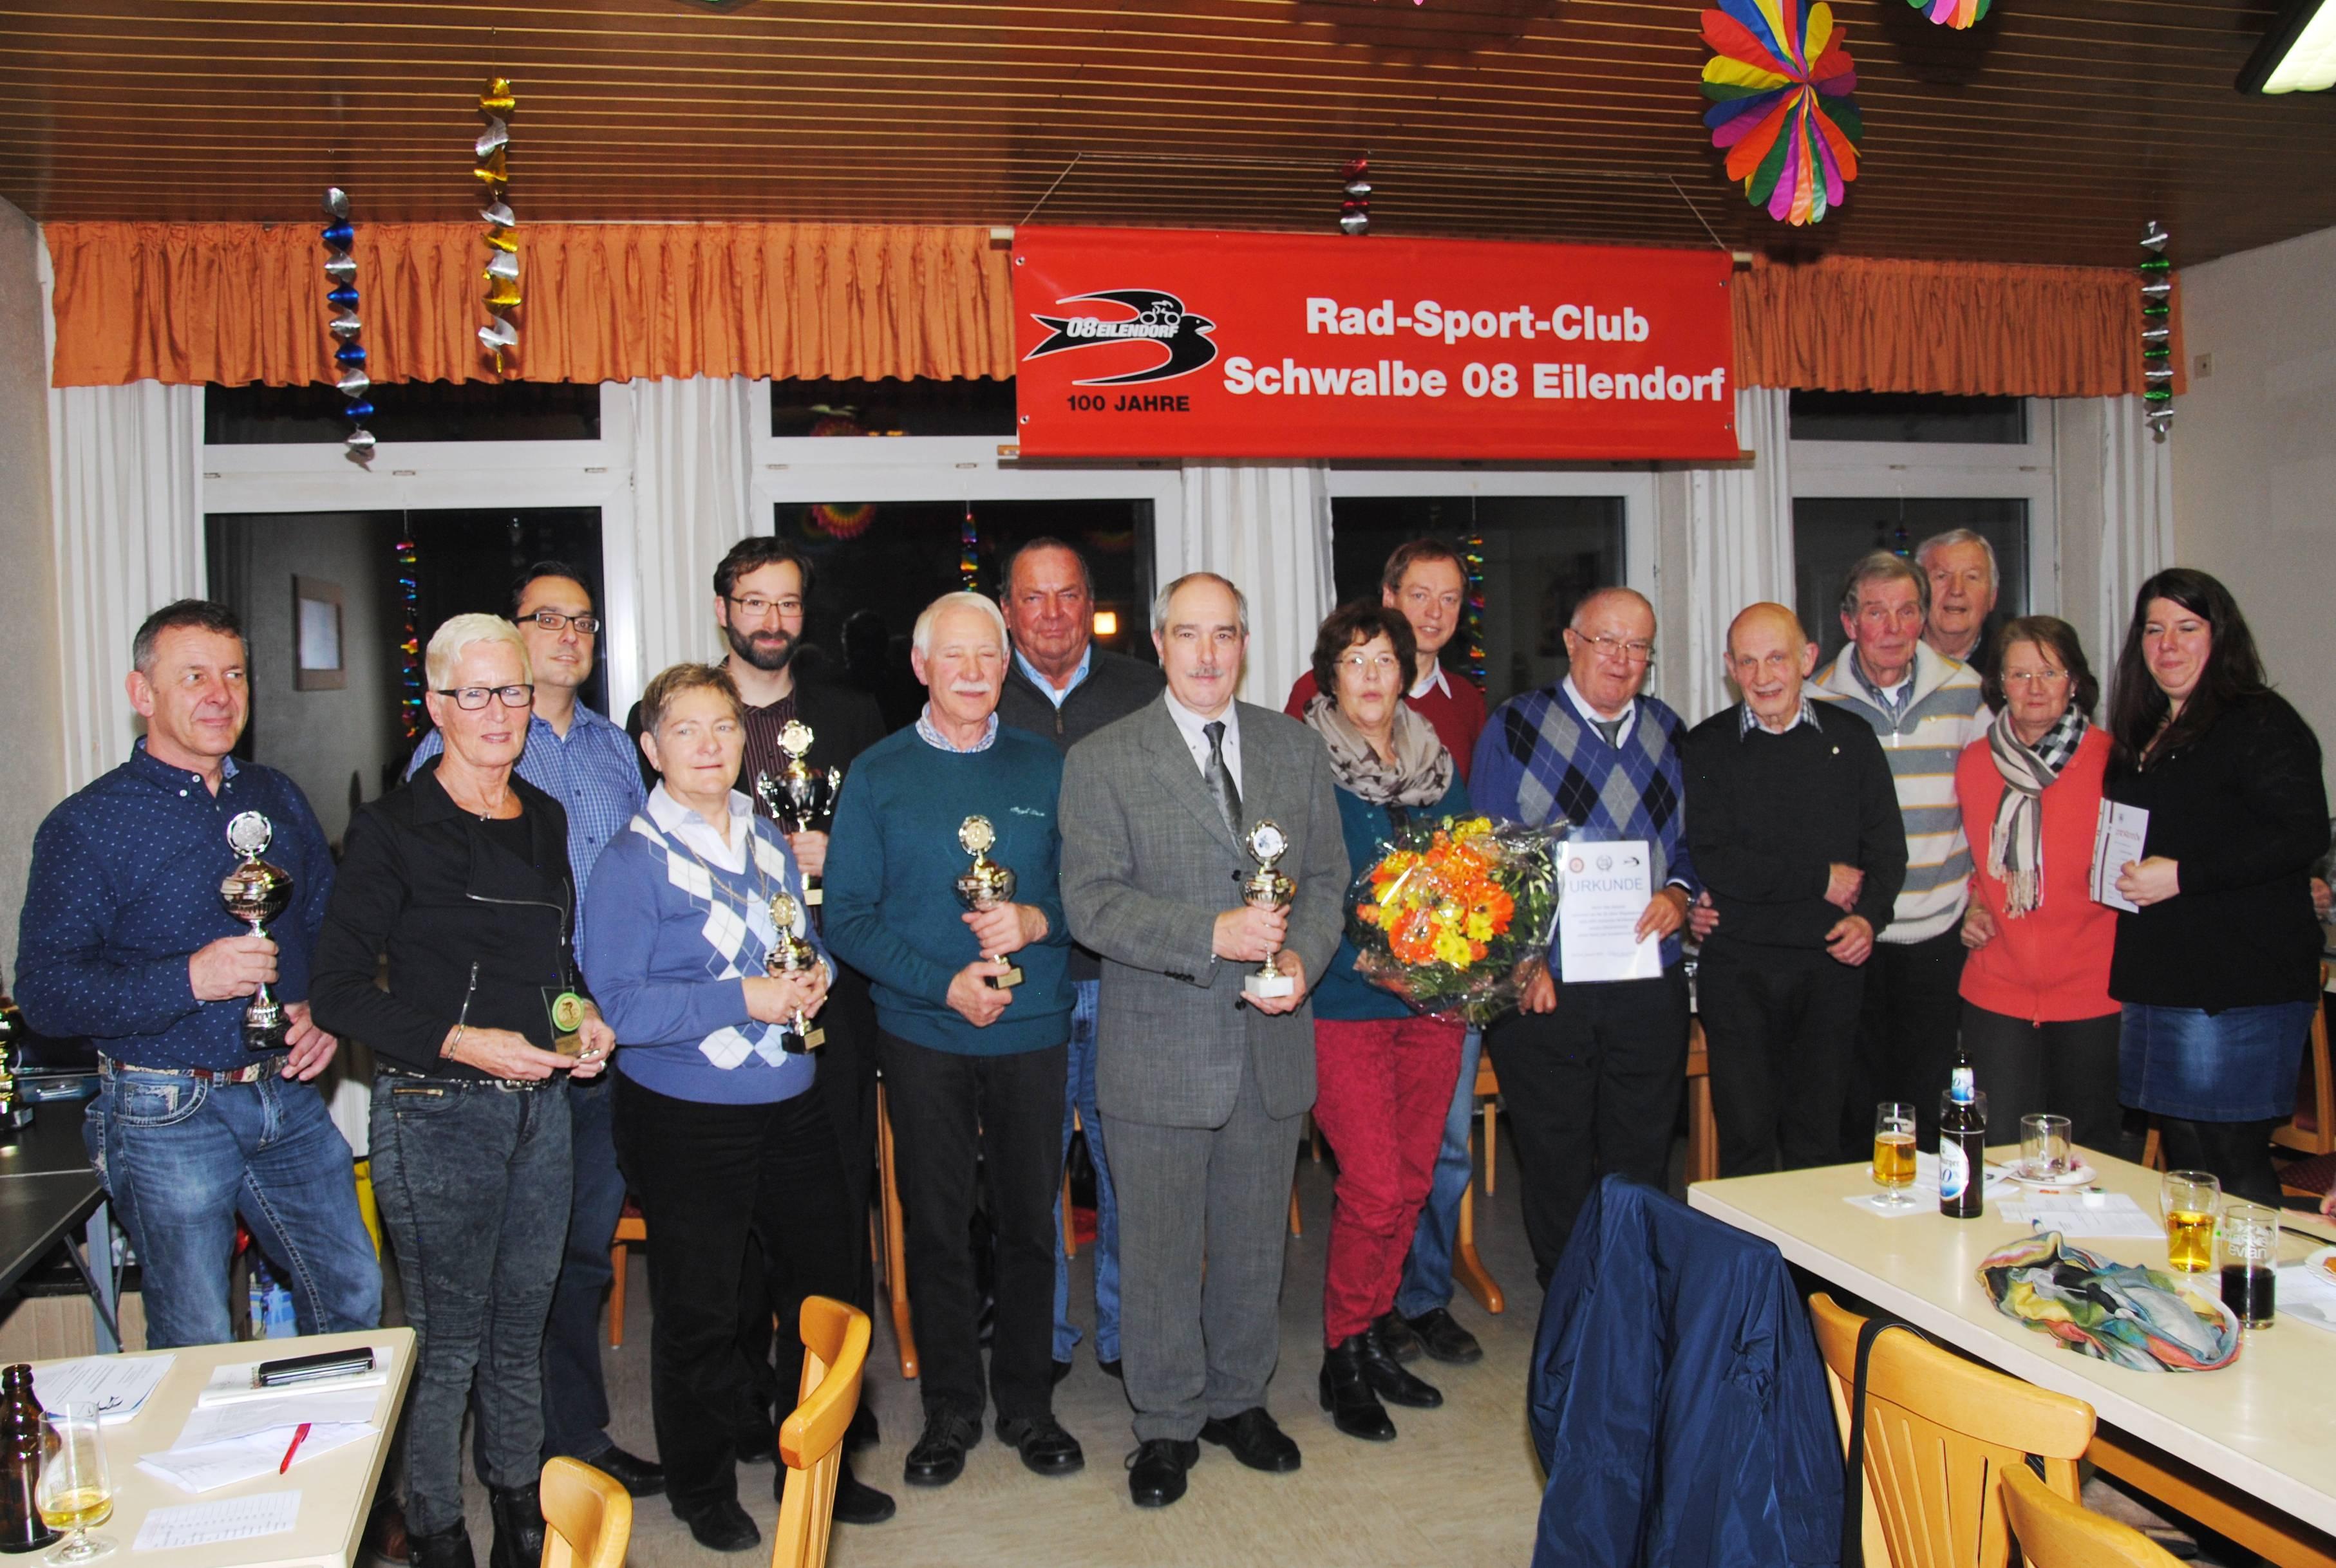 Jahreshauptversammlung 2015 - Preisverleihung